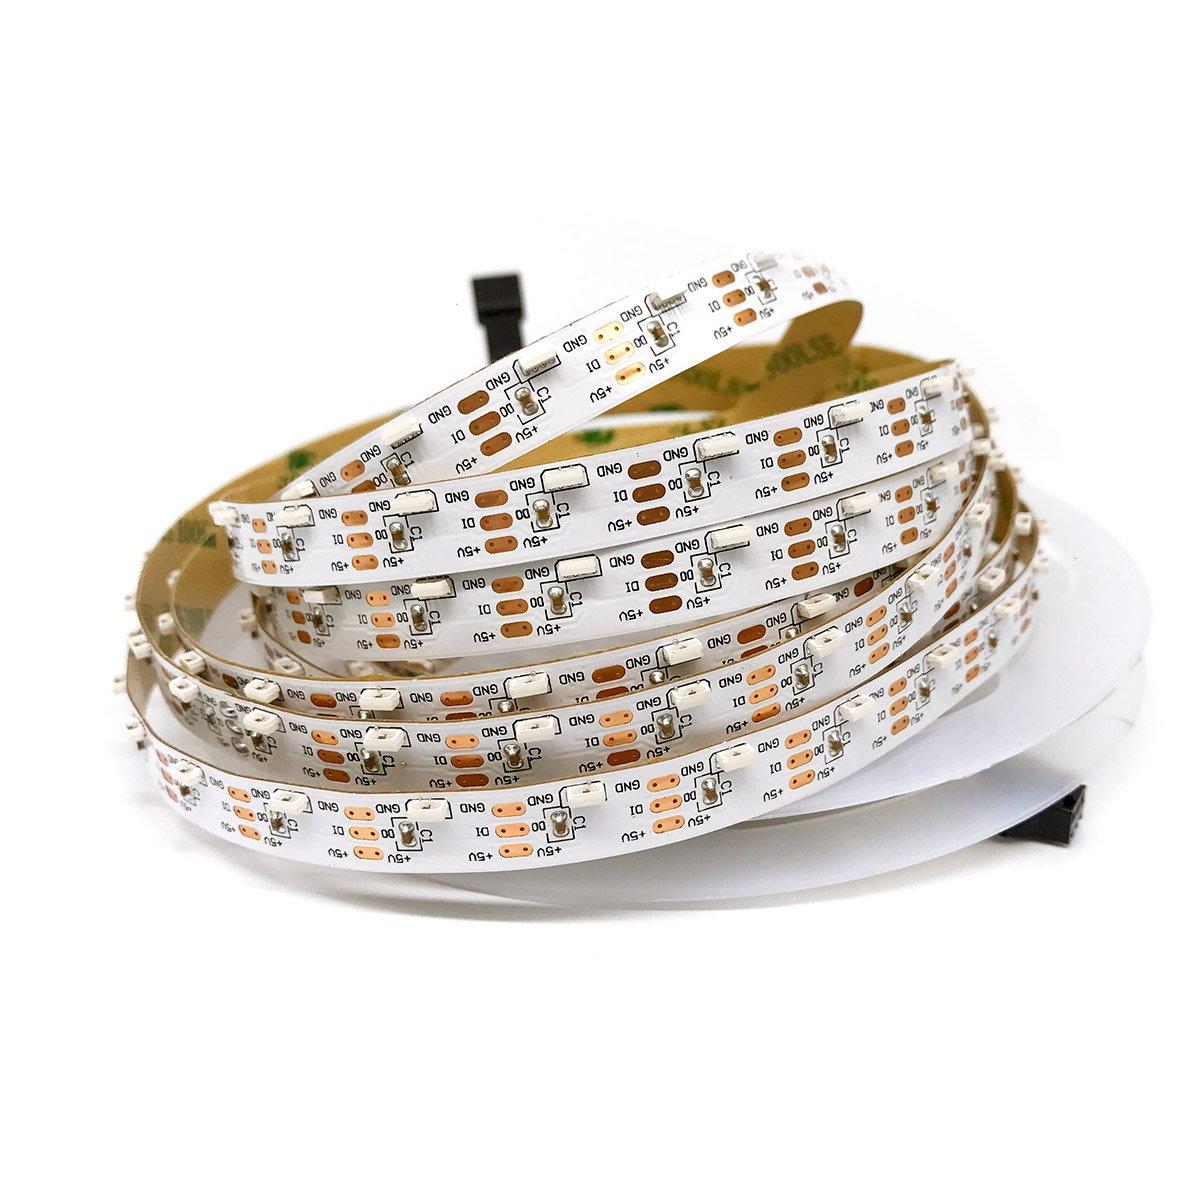 5v 60leds/m 4020 Side Light SK6812 Addressable RGB LED Strip Programmable ws2812b